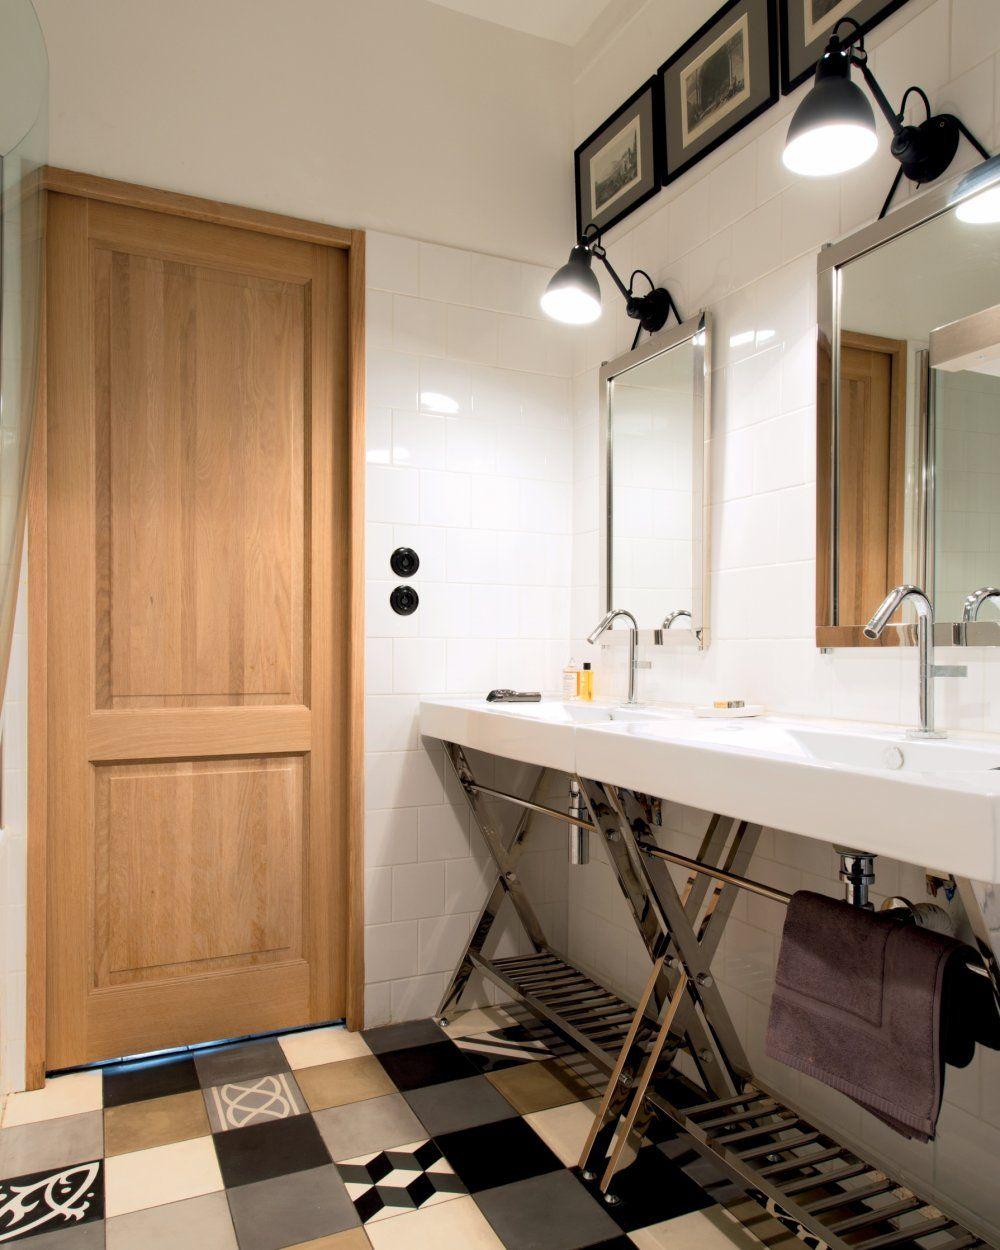 industrial bathrooms - Google Search | Industrial gothic bathroom ...